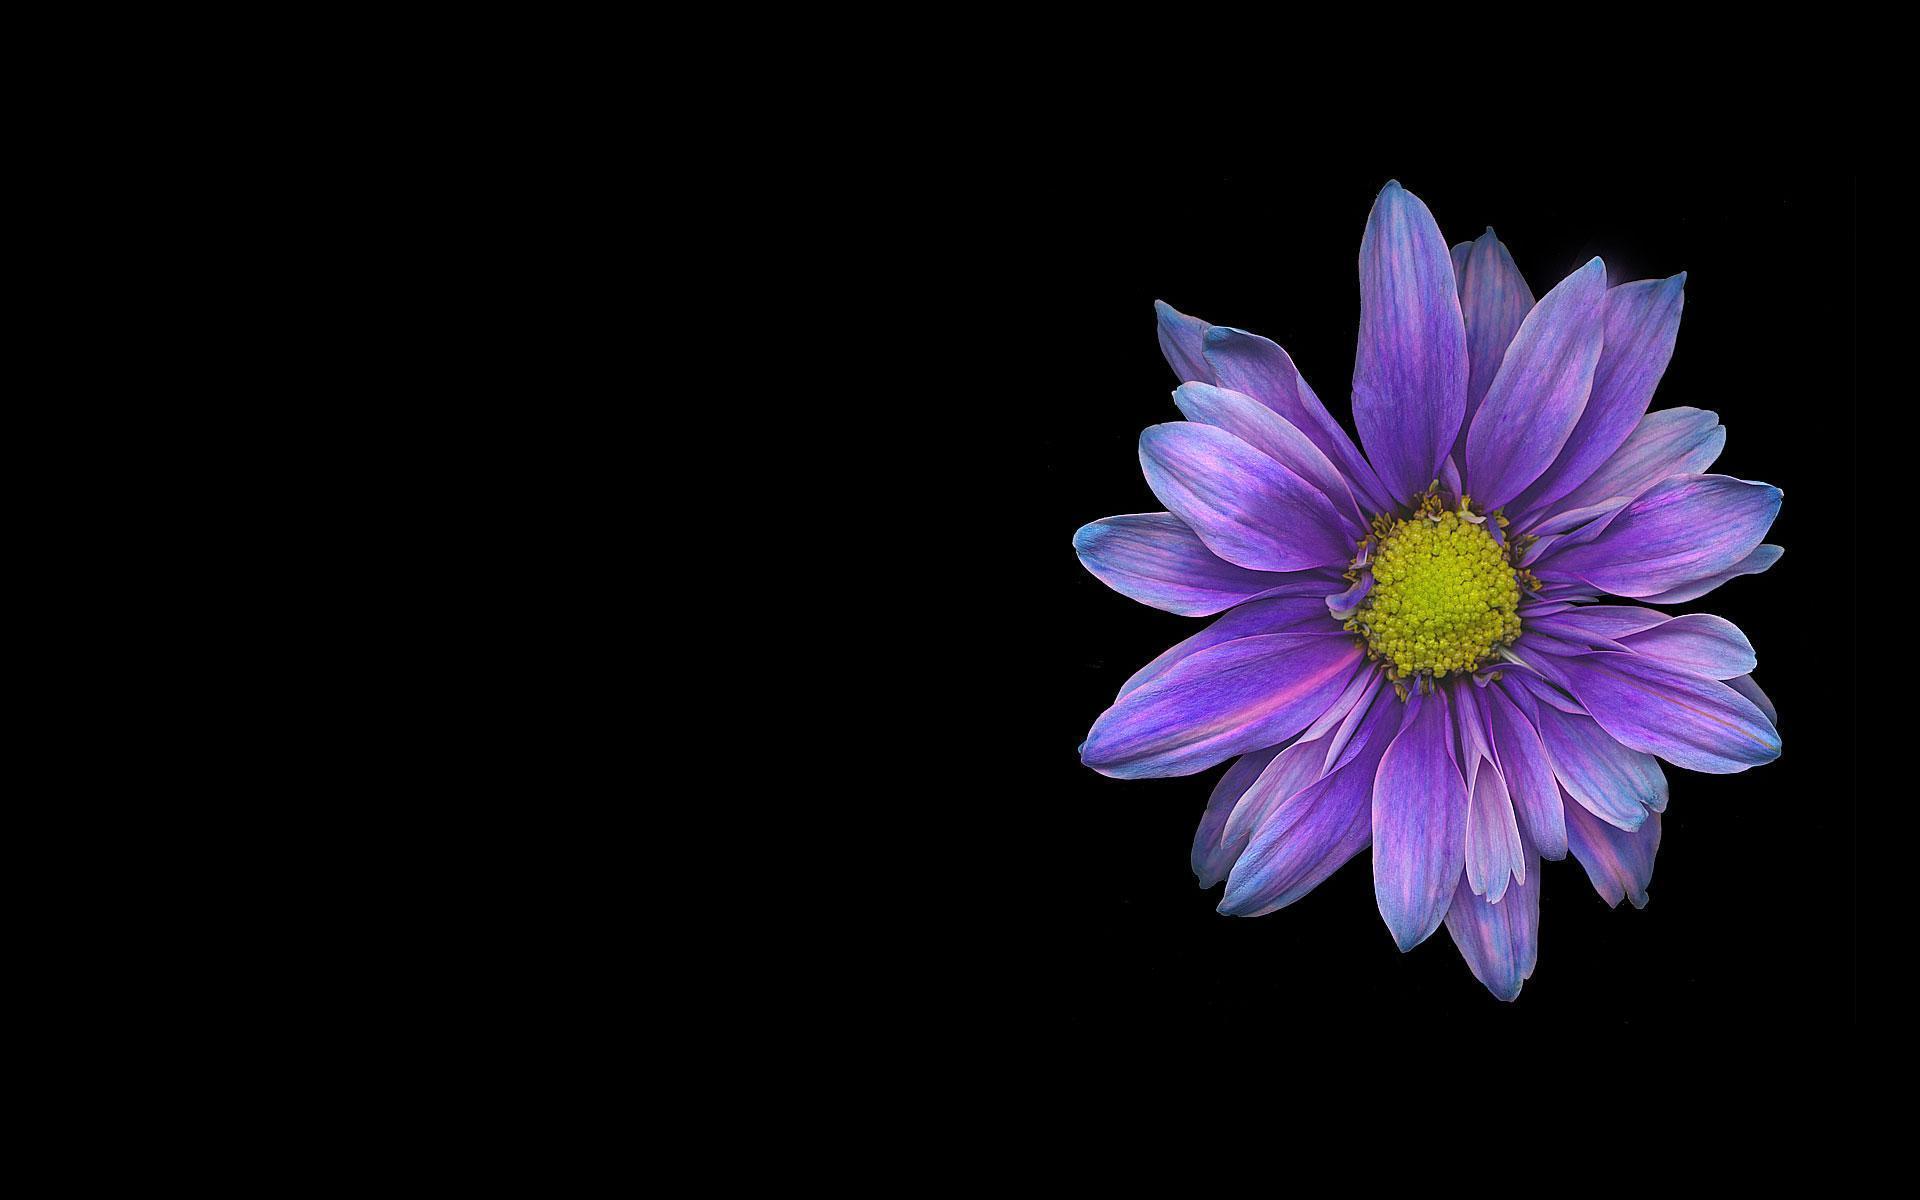 Single Flower wallpaper - 460675